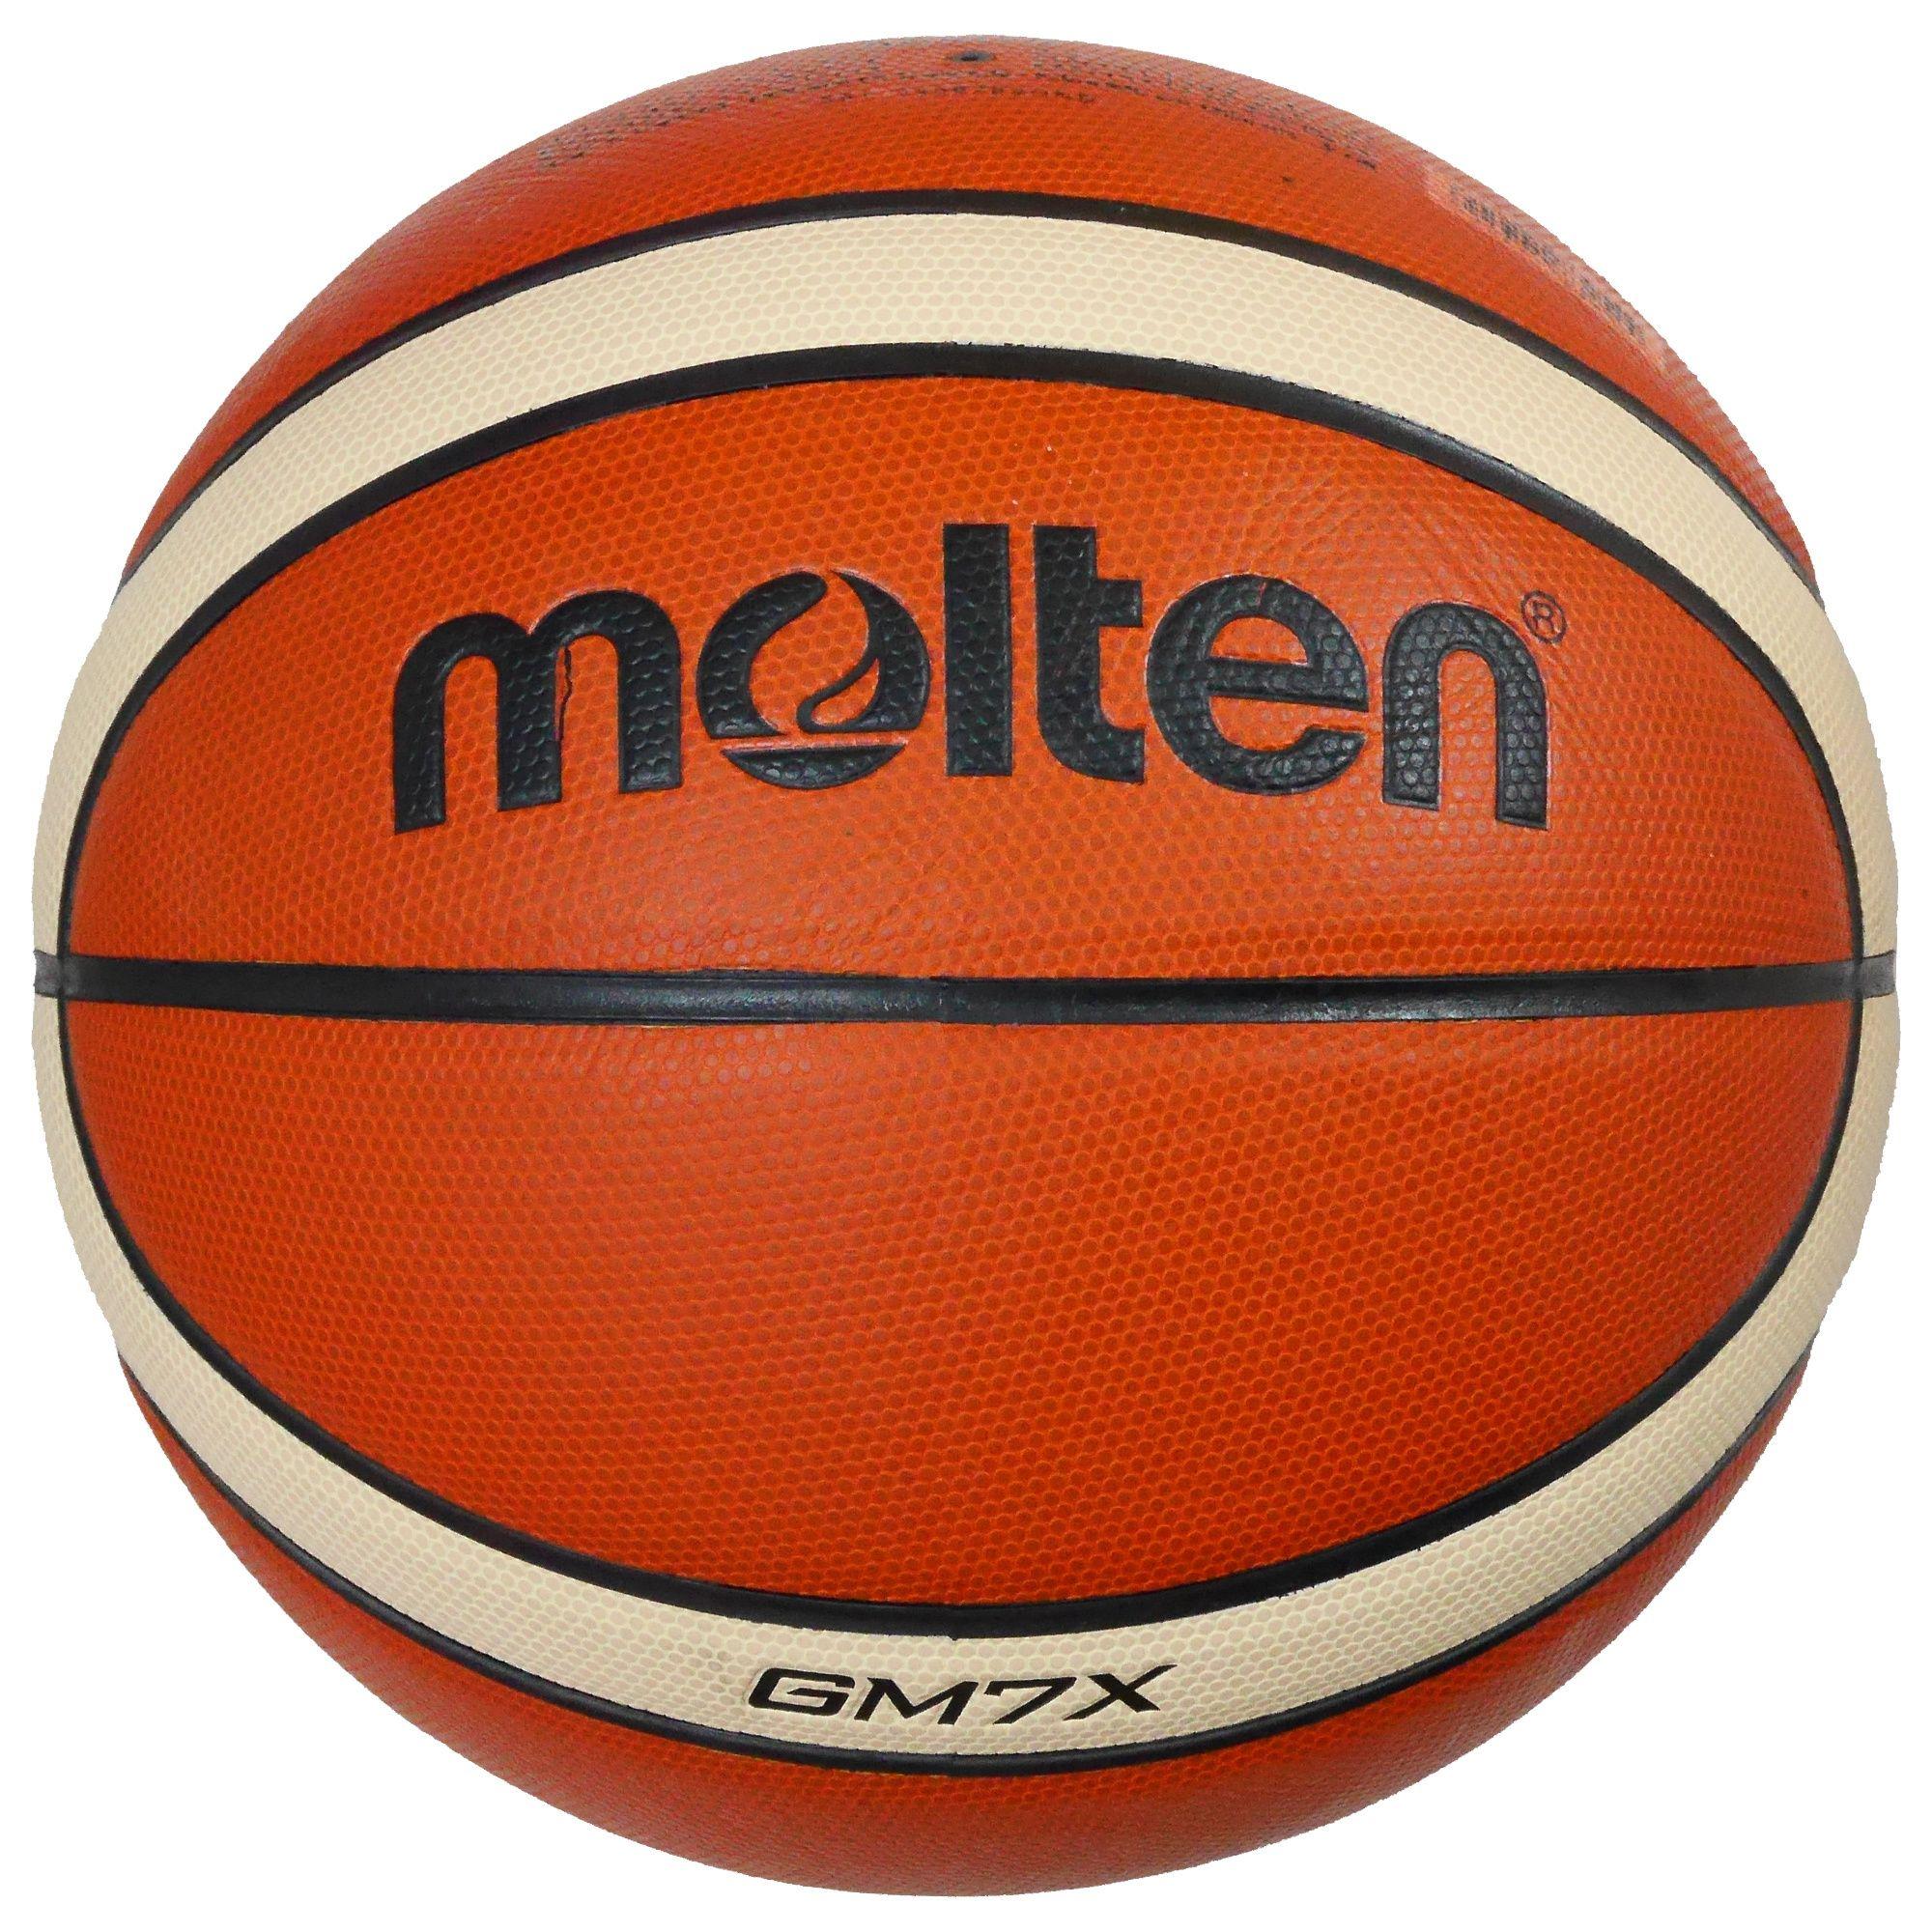 MOLTEN Molten BGM7X Basketball